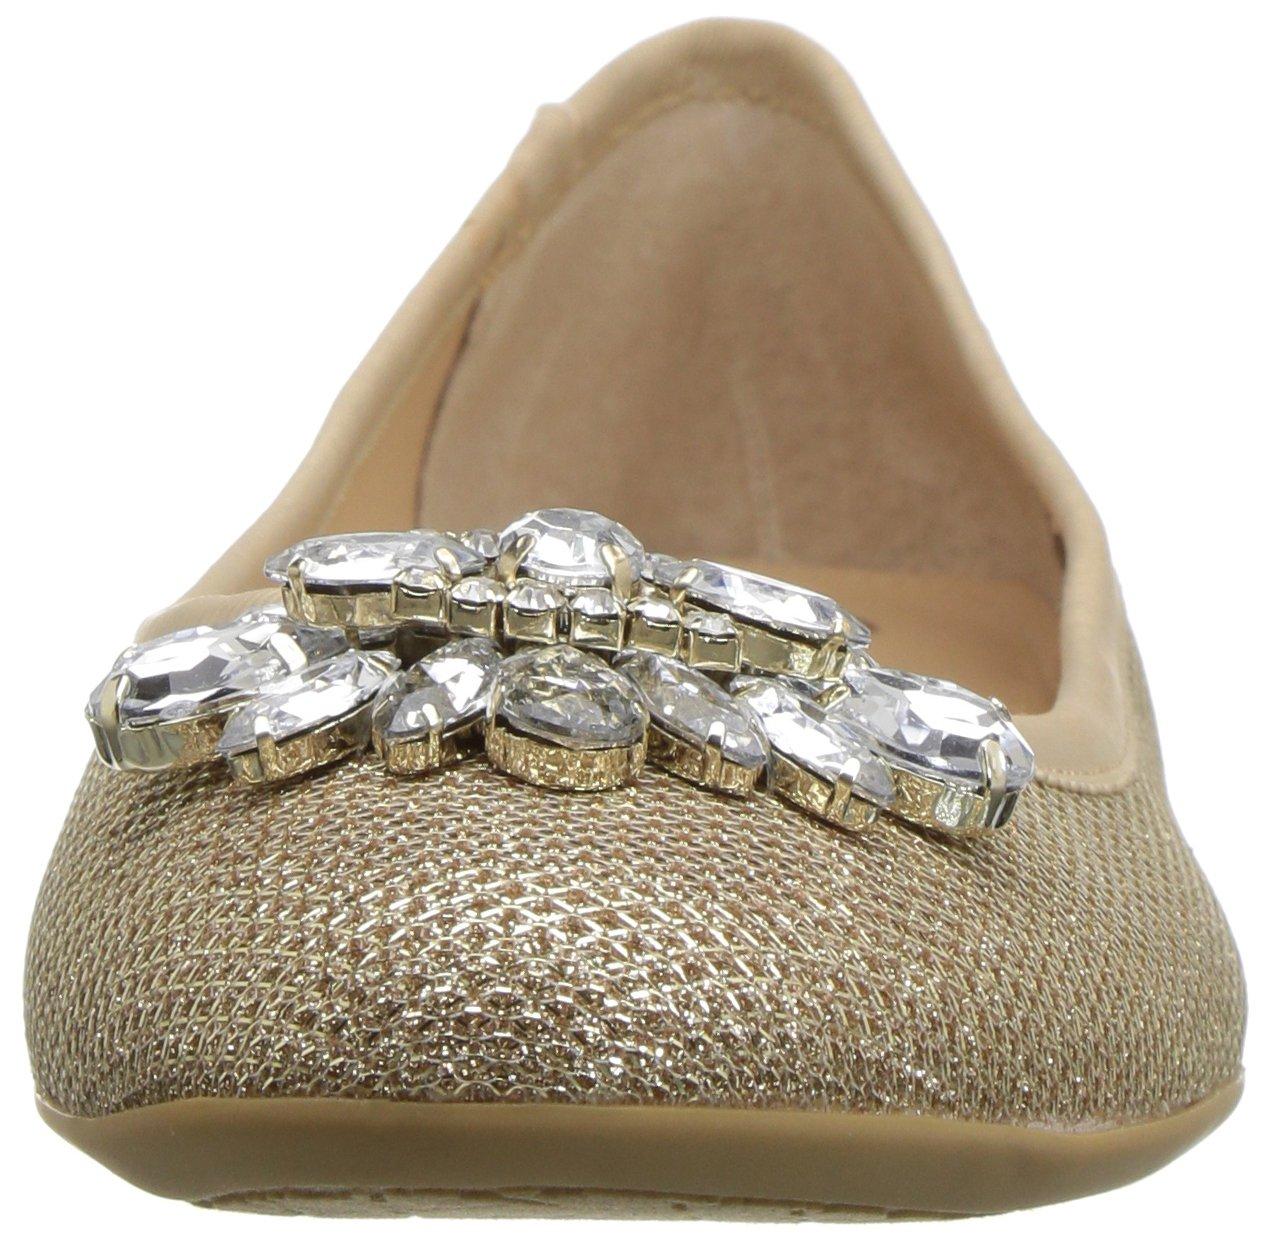 f0943c114 ... Badgley Badgley Badgley Mischka Jewel Women's Cabella Ballet Flat  B01M34JZCX 10 B(M) US ...